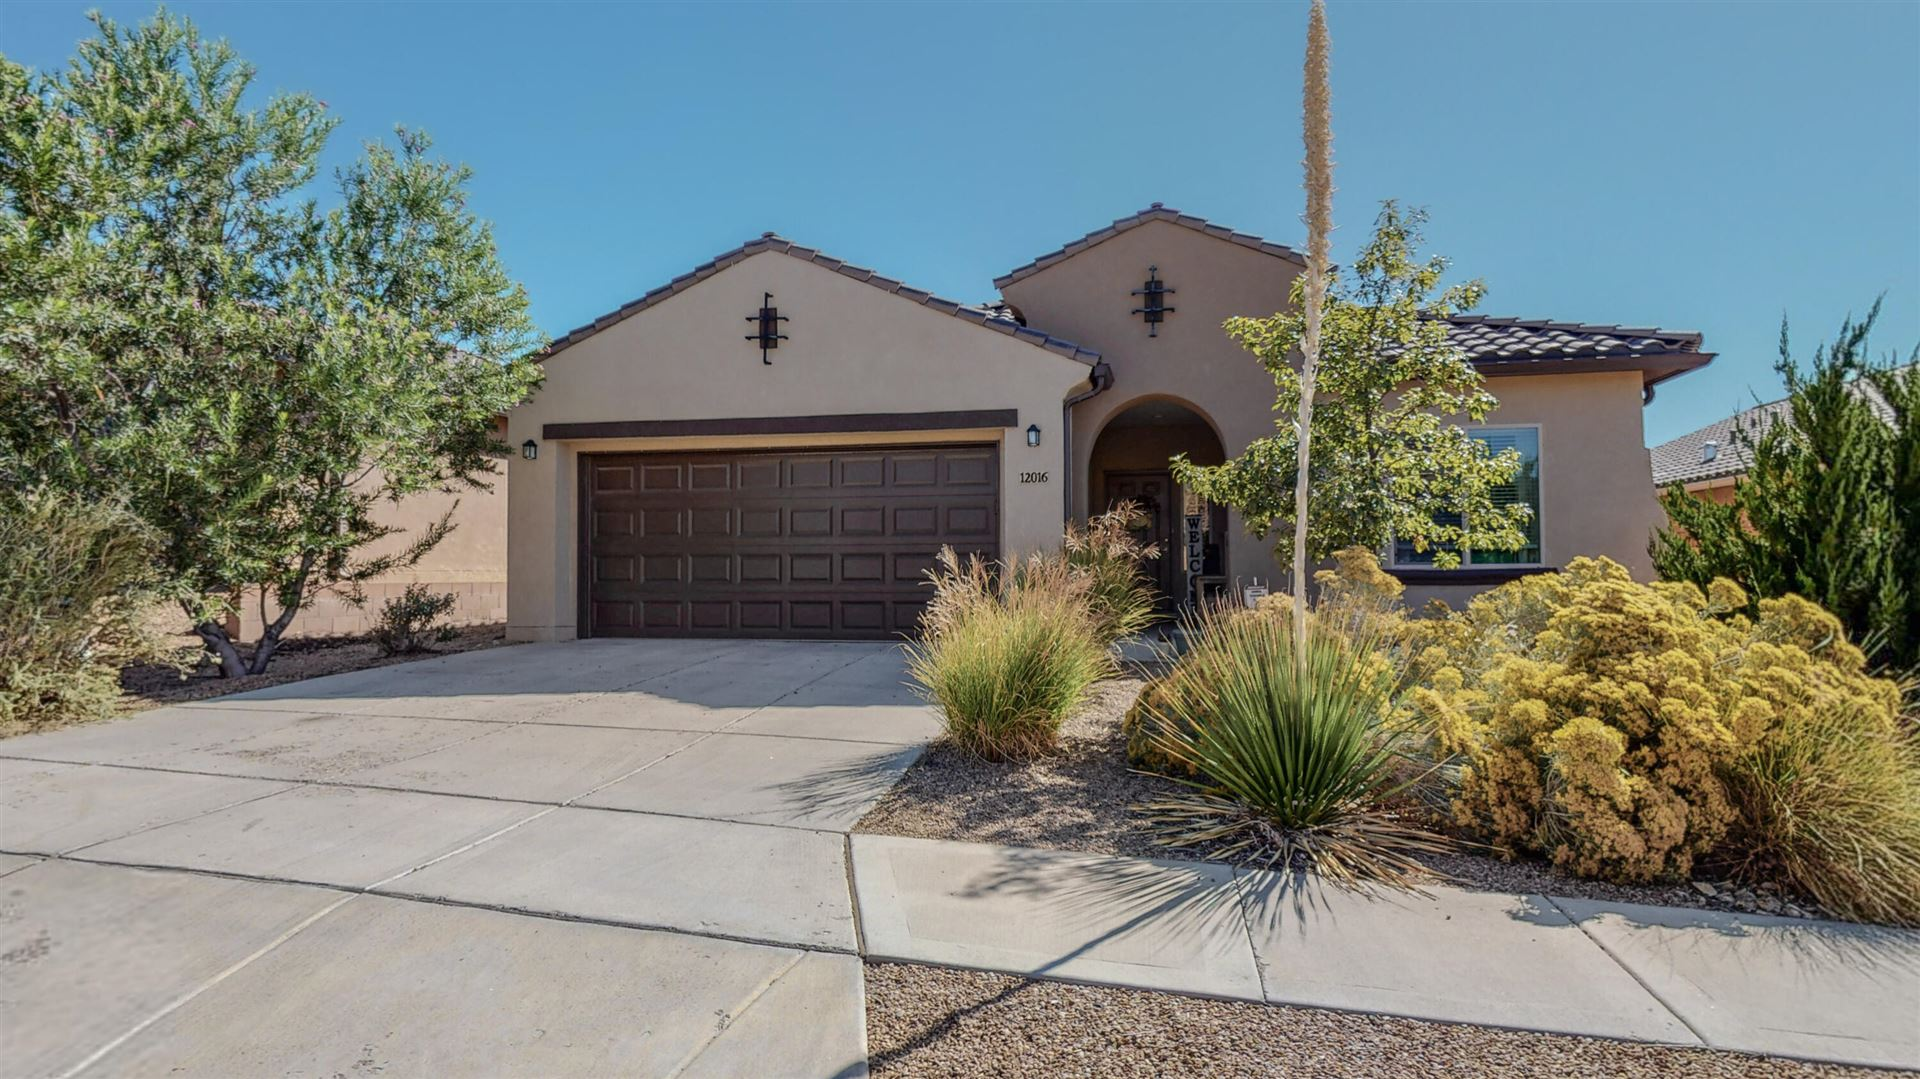 12016 Nashua Road SE, Albuquerque, NM 87123 - #: 1001617